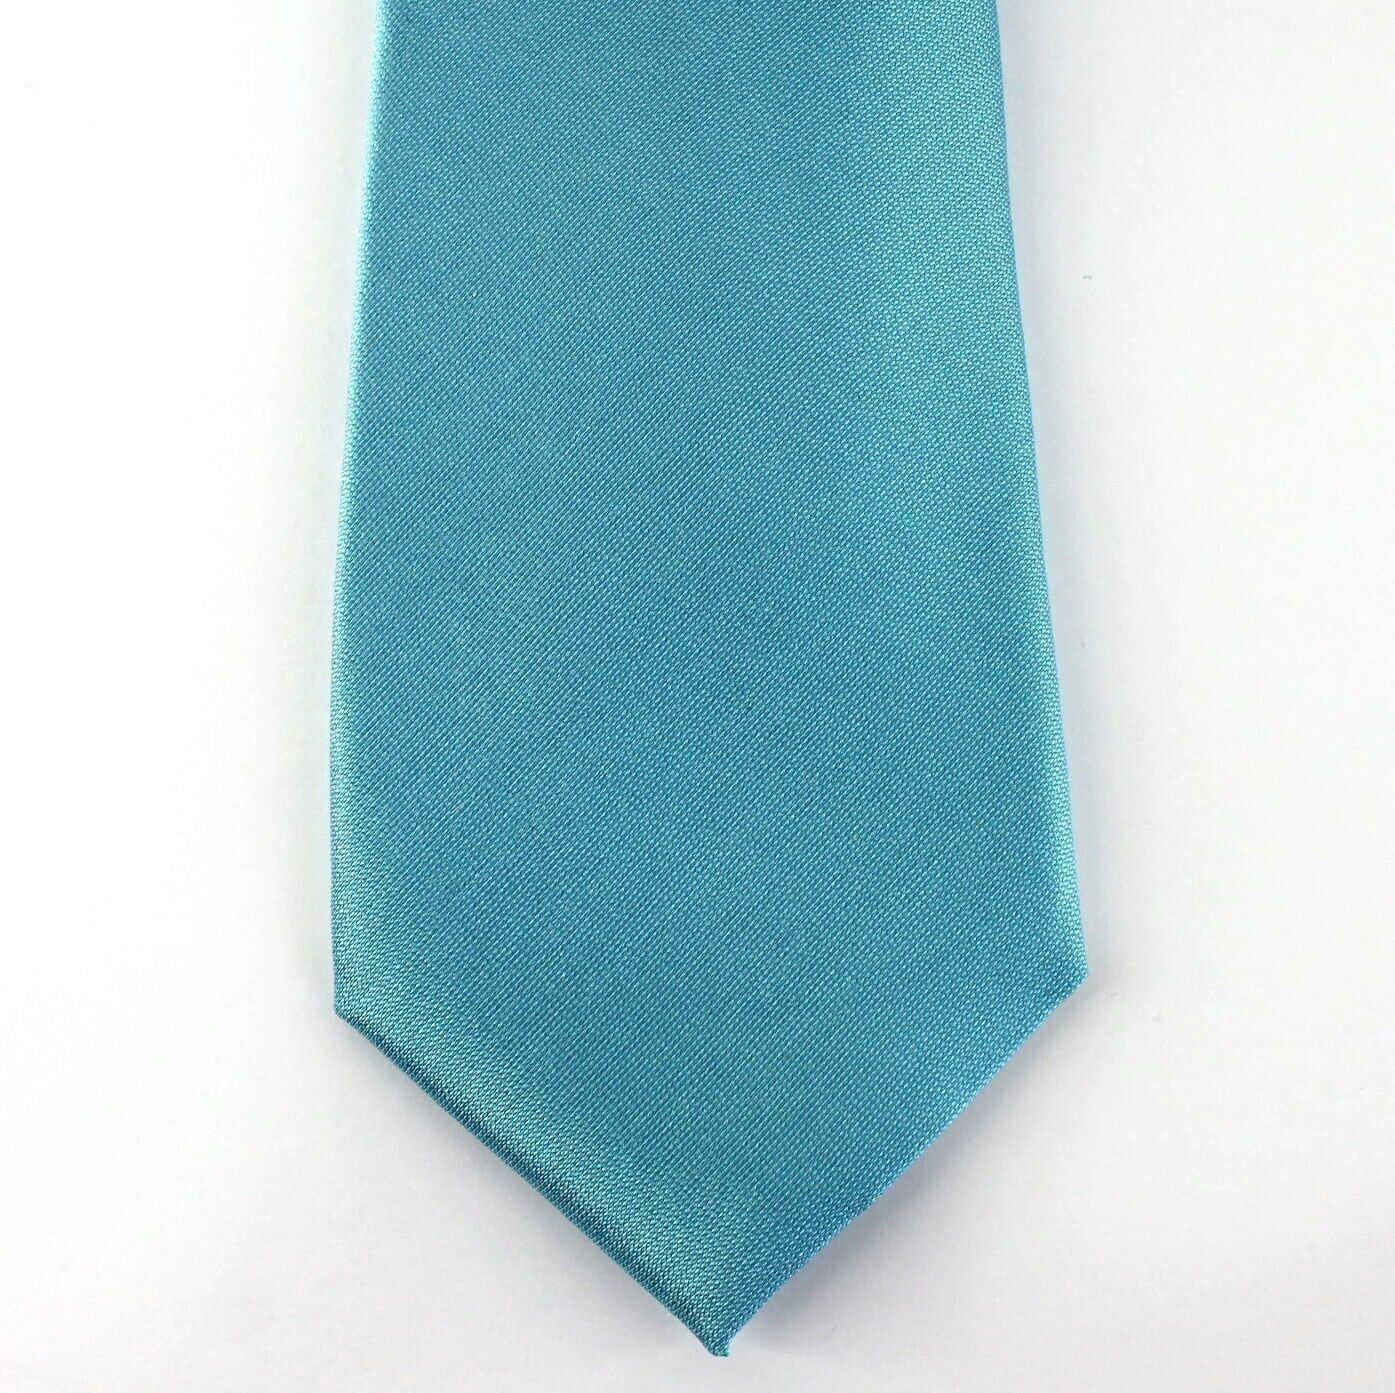 Alfani Neck Tie Aqua Blue Avenue Solid 100% Silk Slim Skinny Mens New